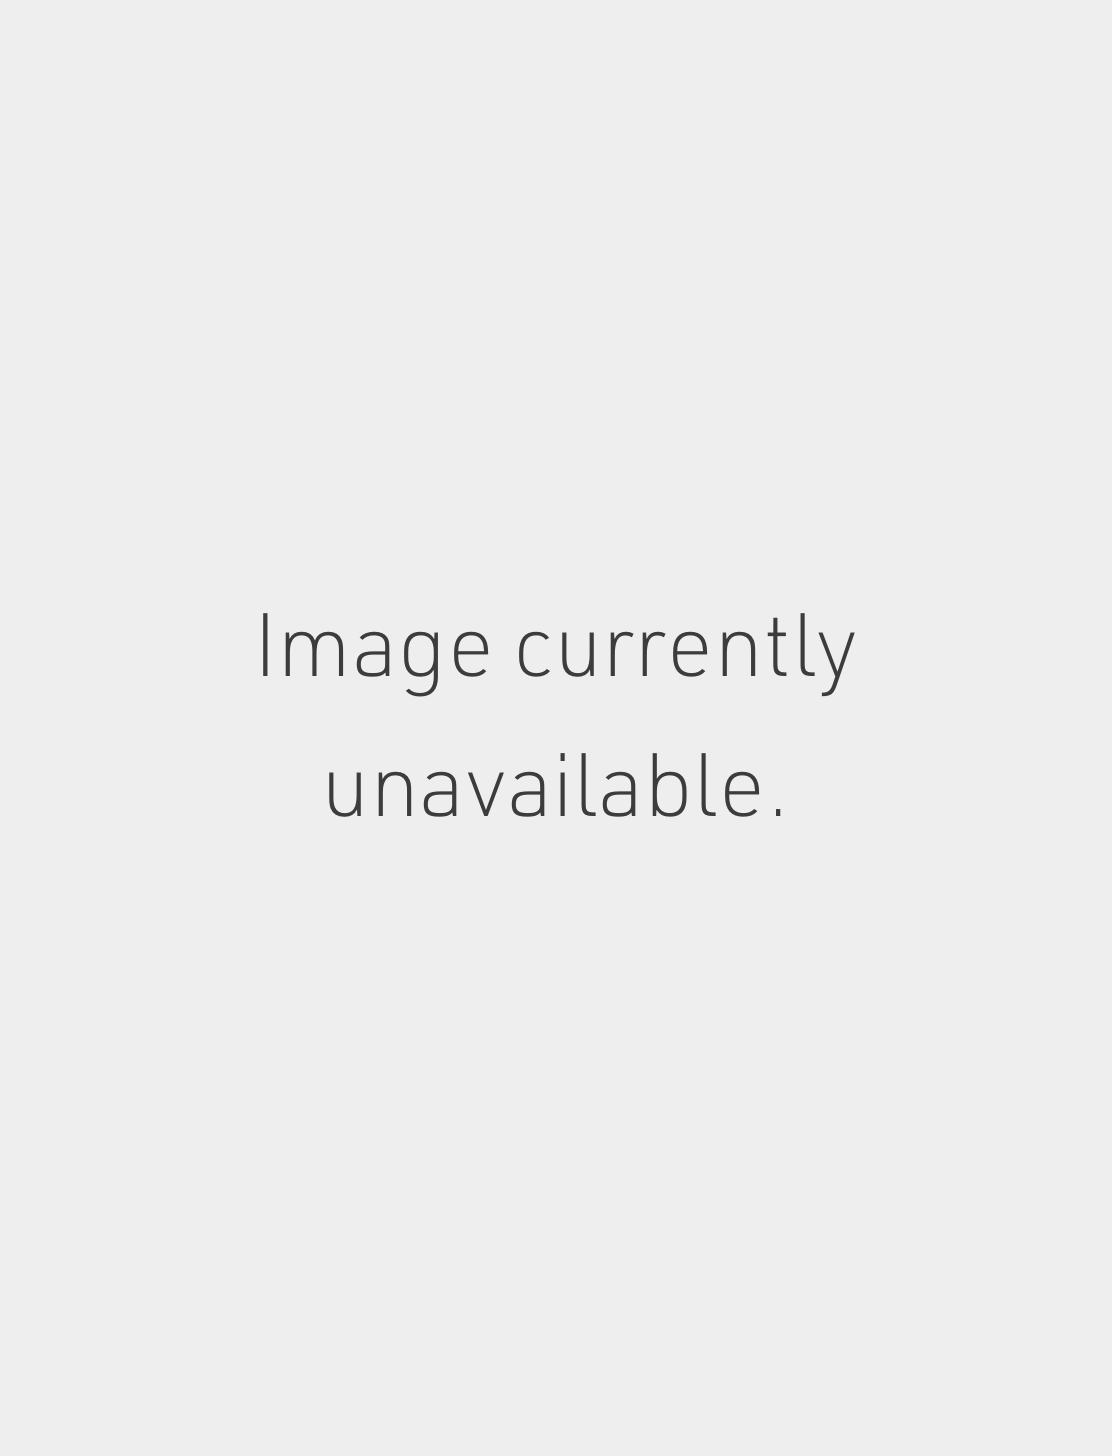 Short Talon with Petite Diamonds Threaded Stud Image #1